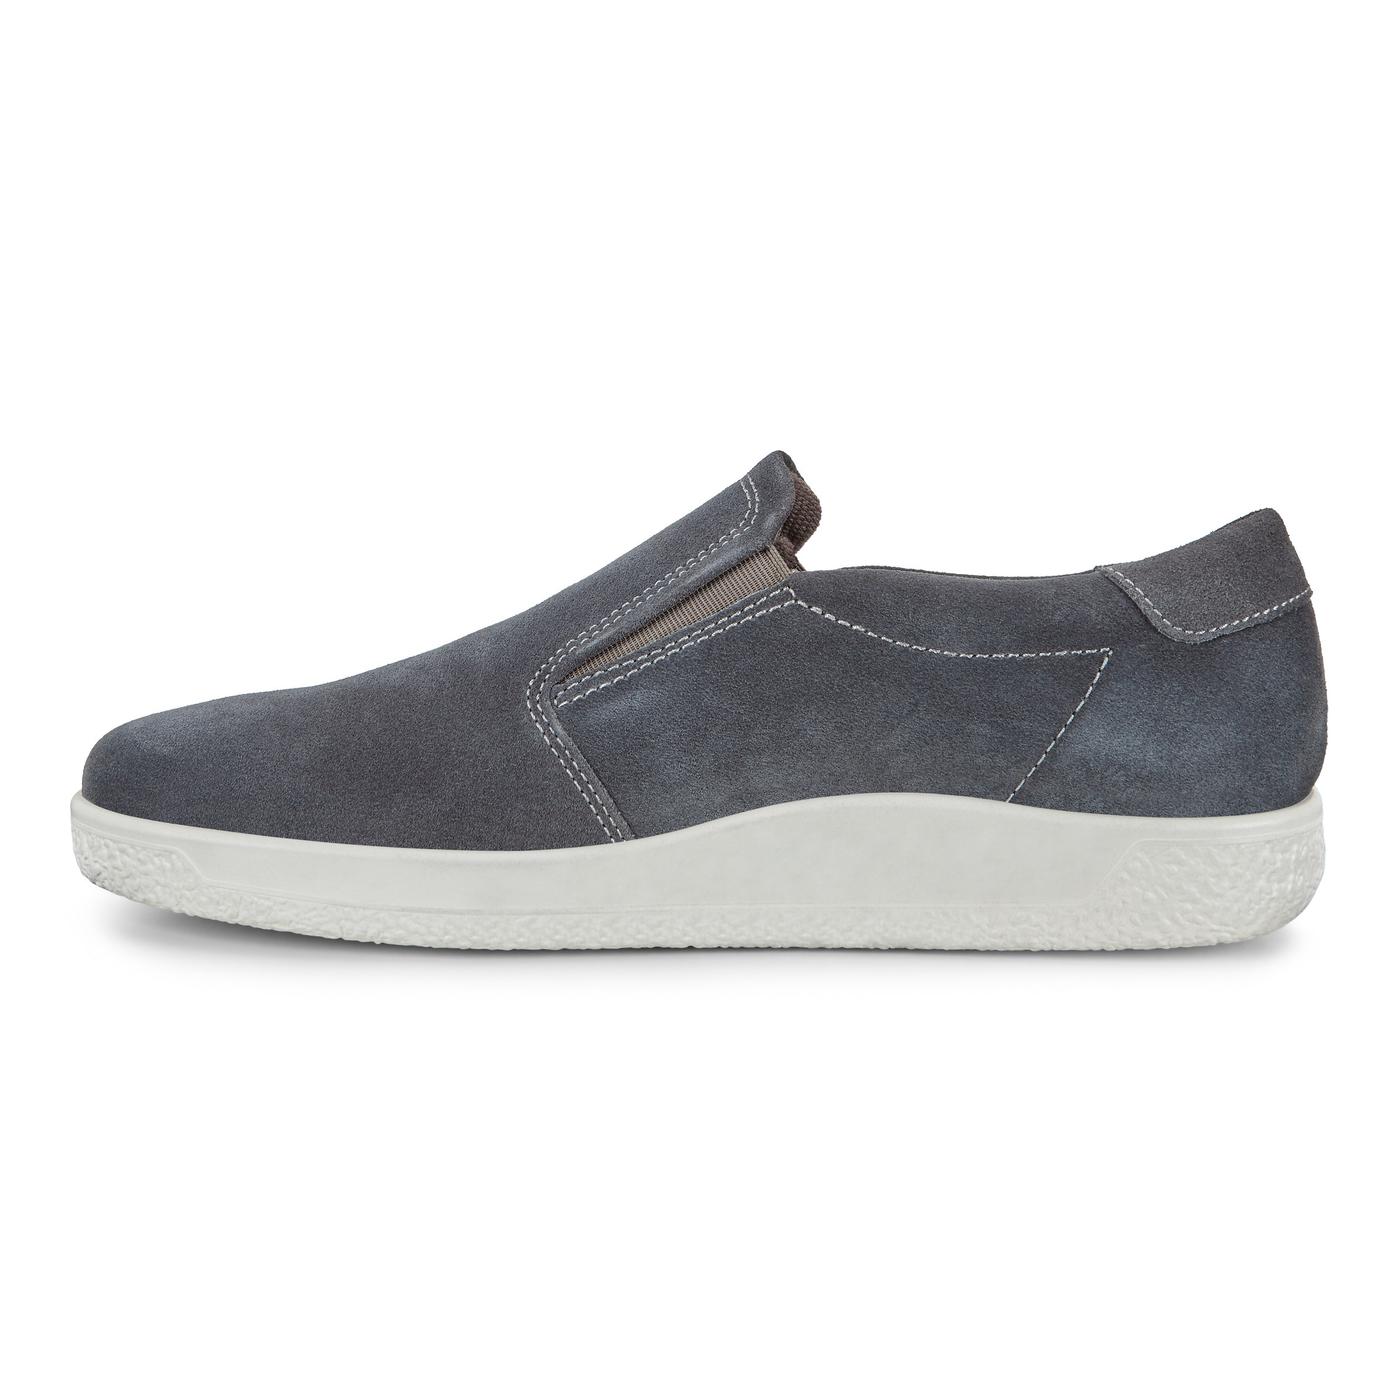 ECCO SOFT1 Mens Sneaker Slip On